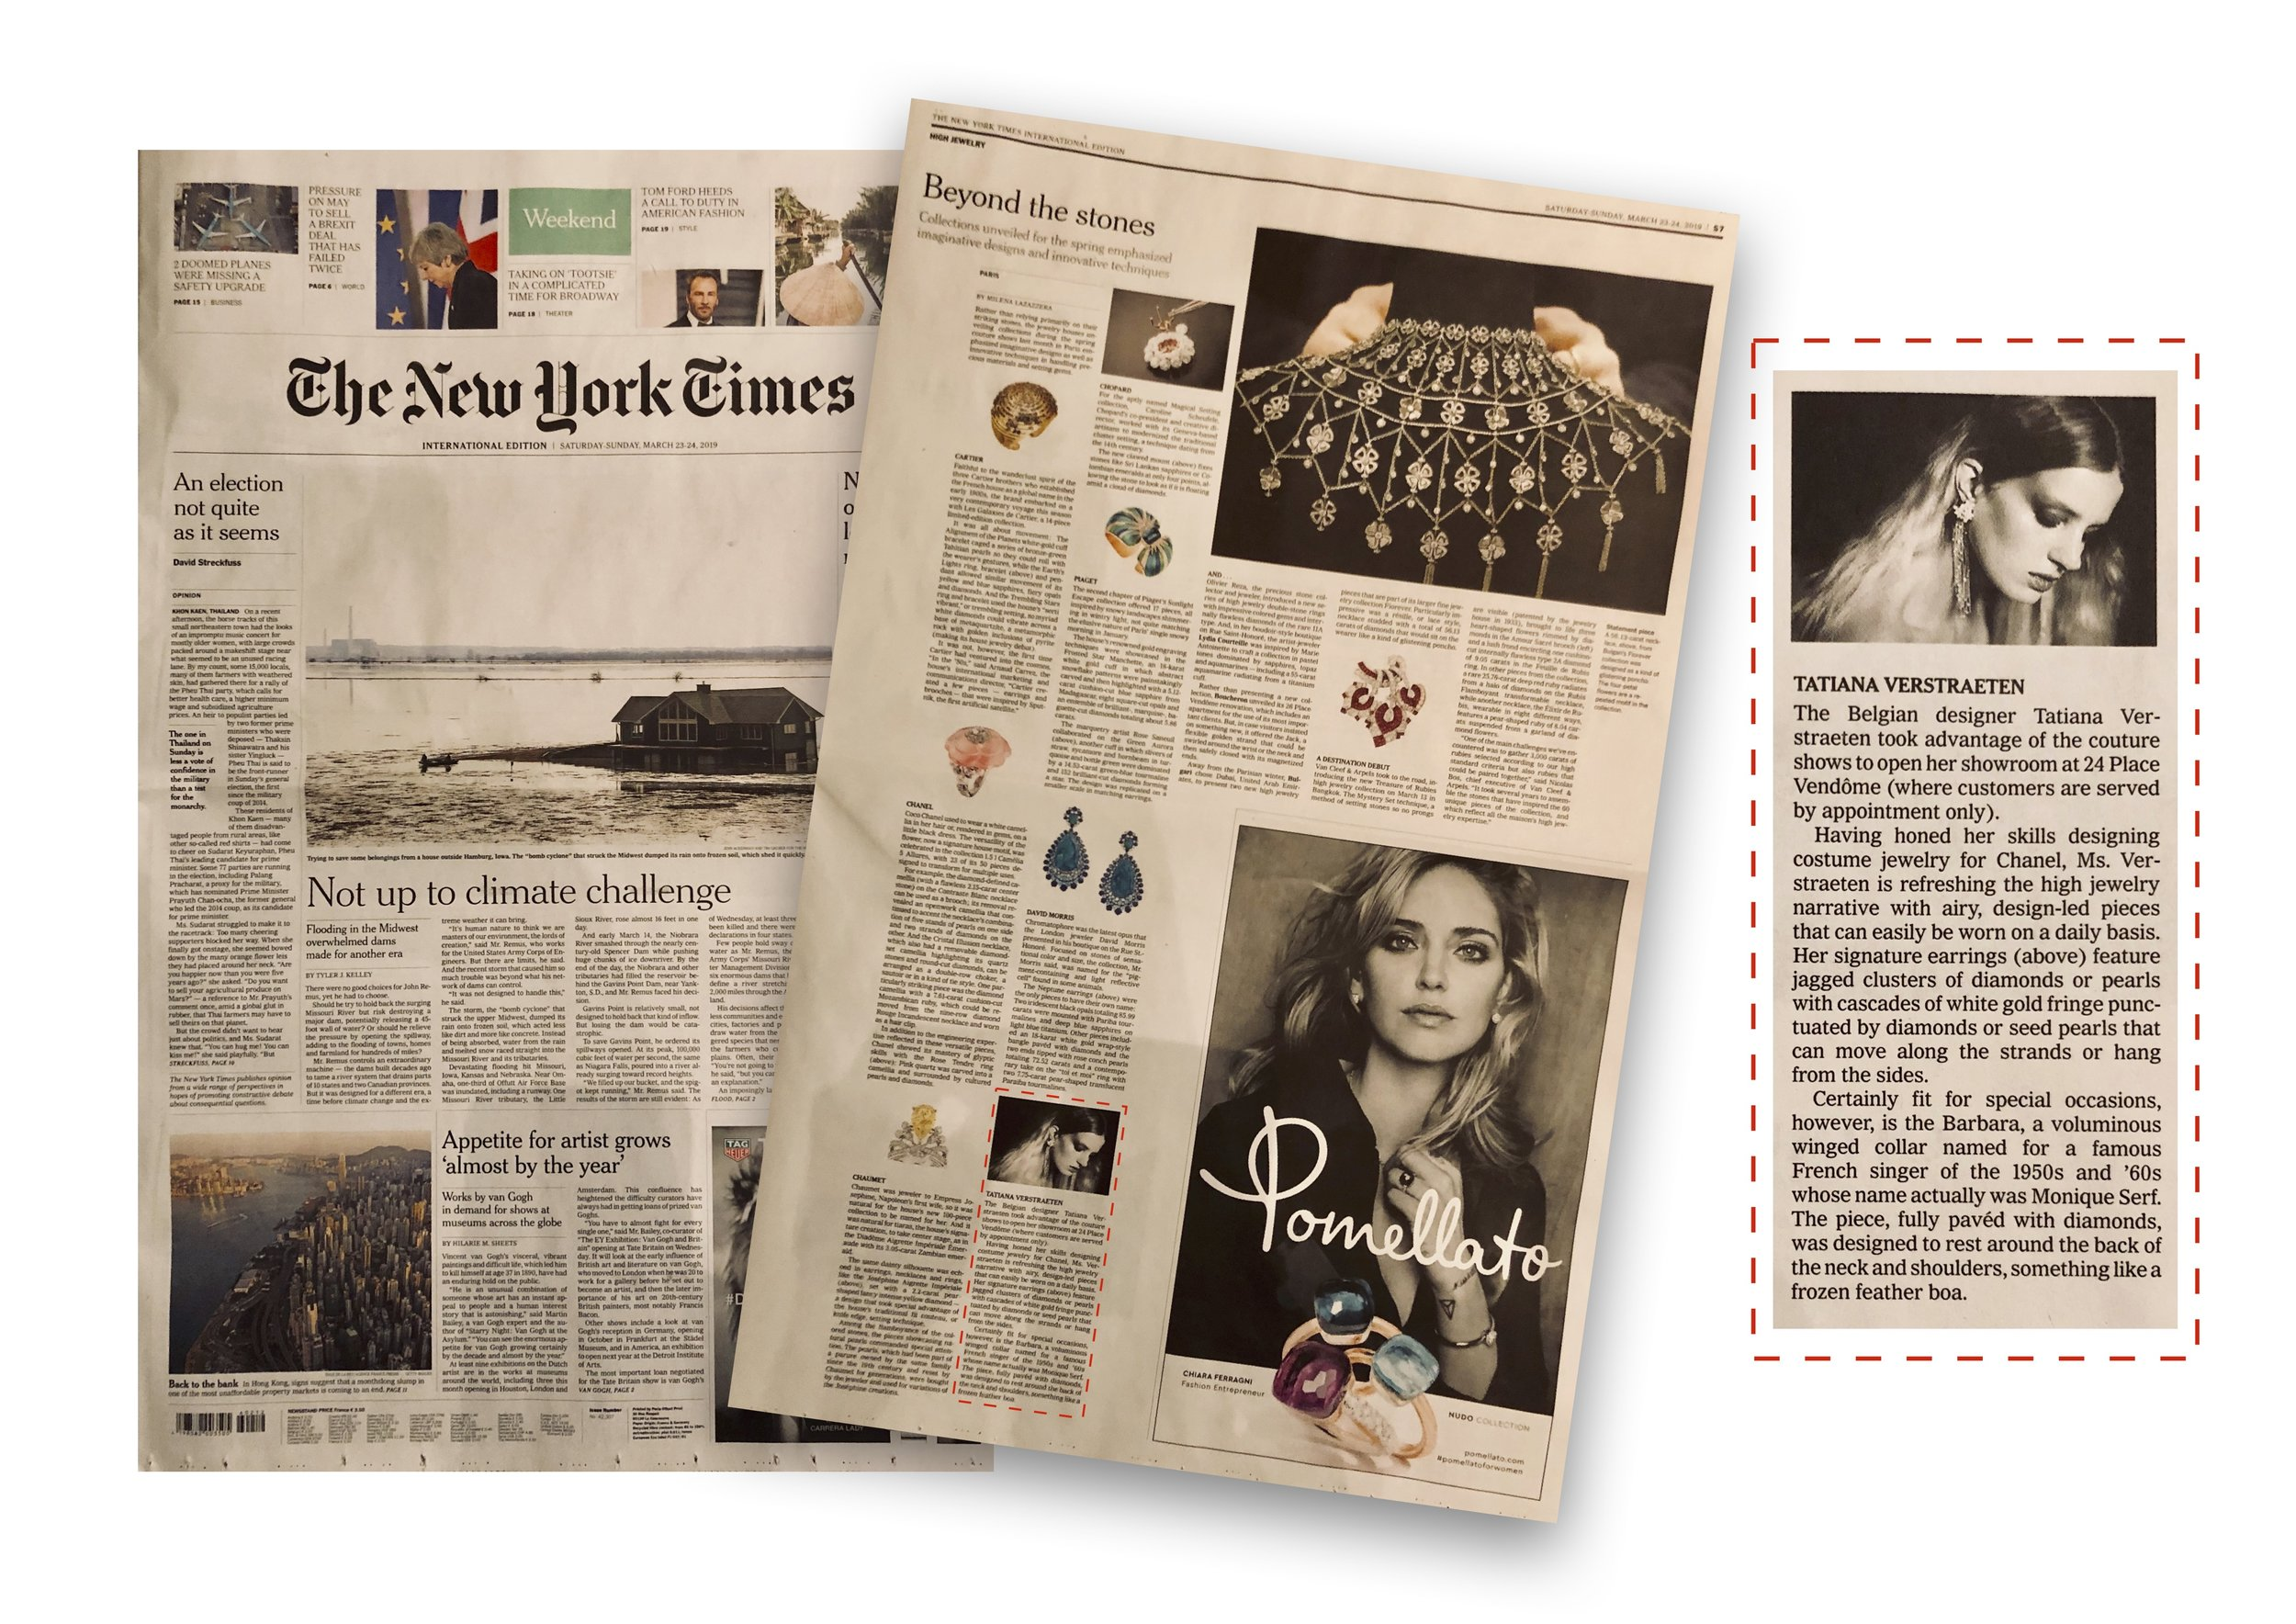 TheNewYorkTimes_TatianaVerstraetenJewlery (jpeg).jpg